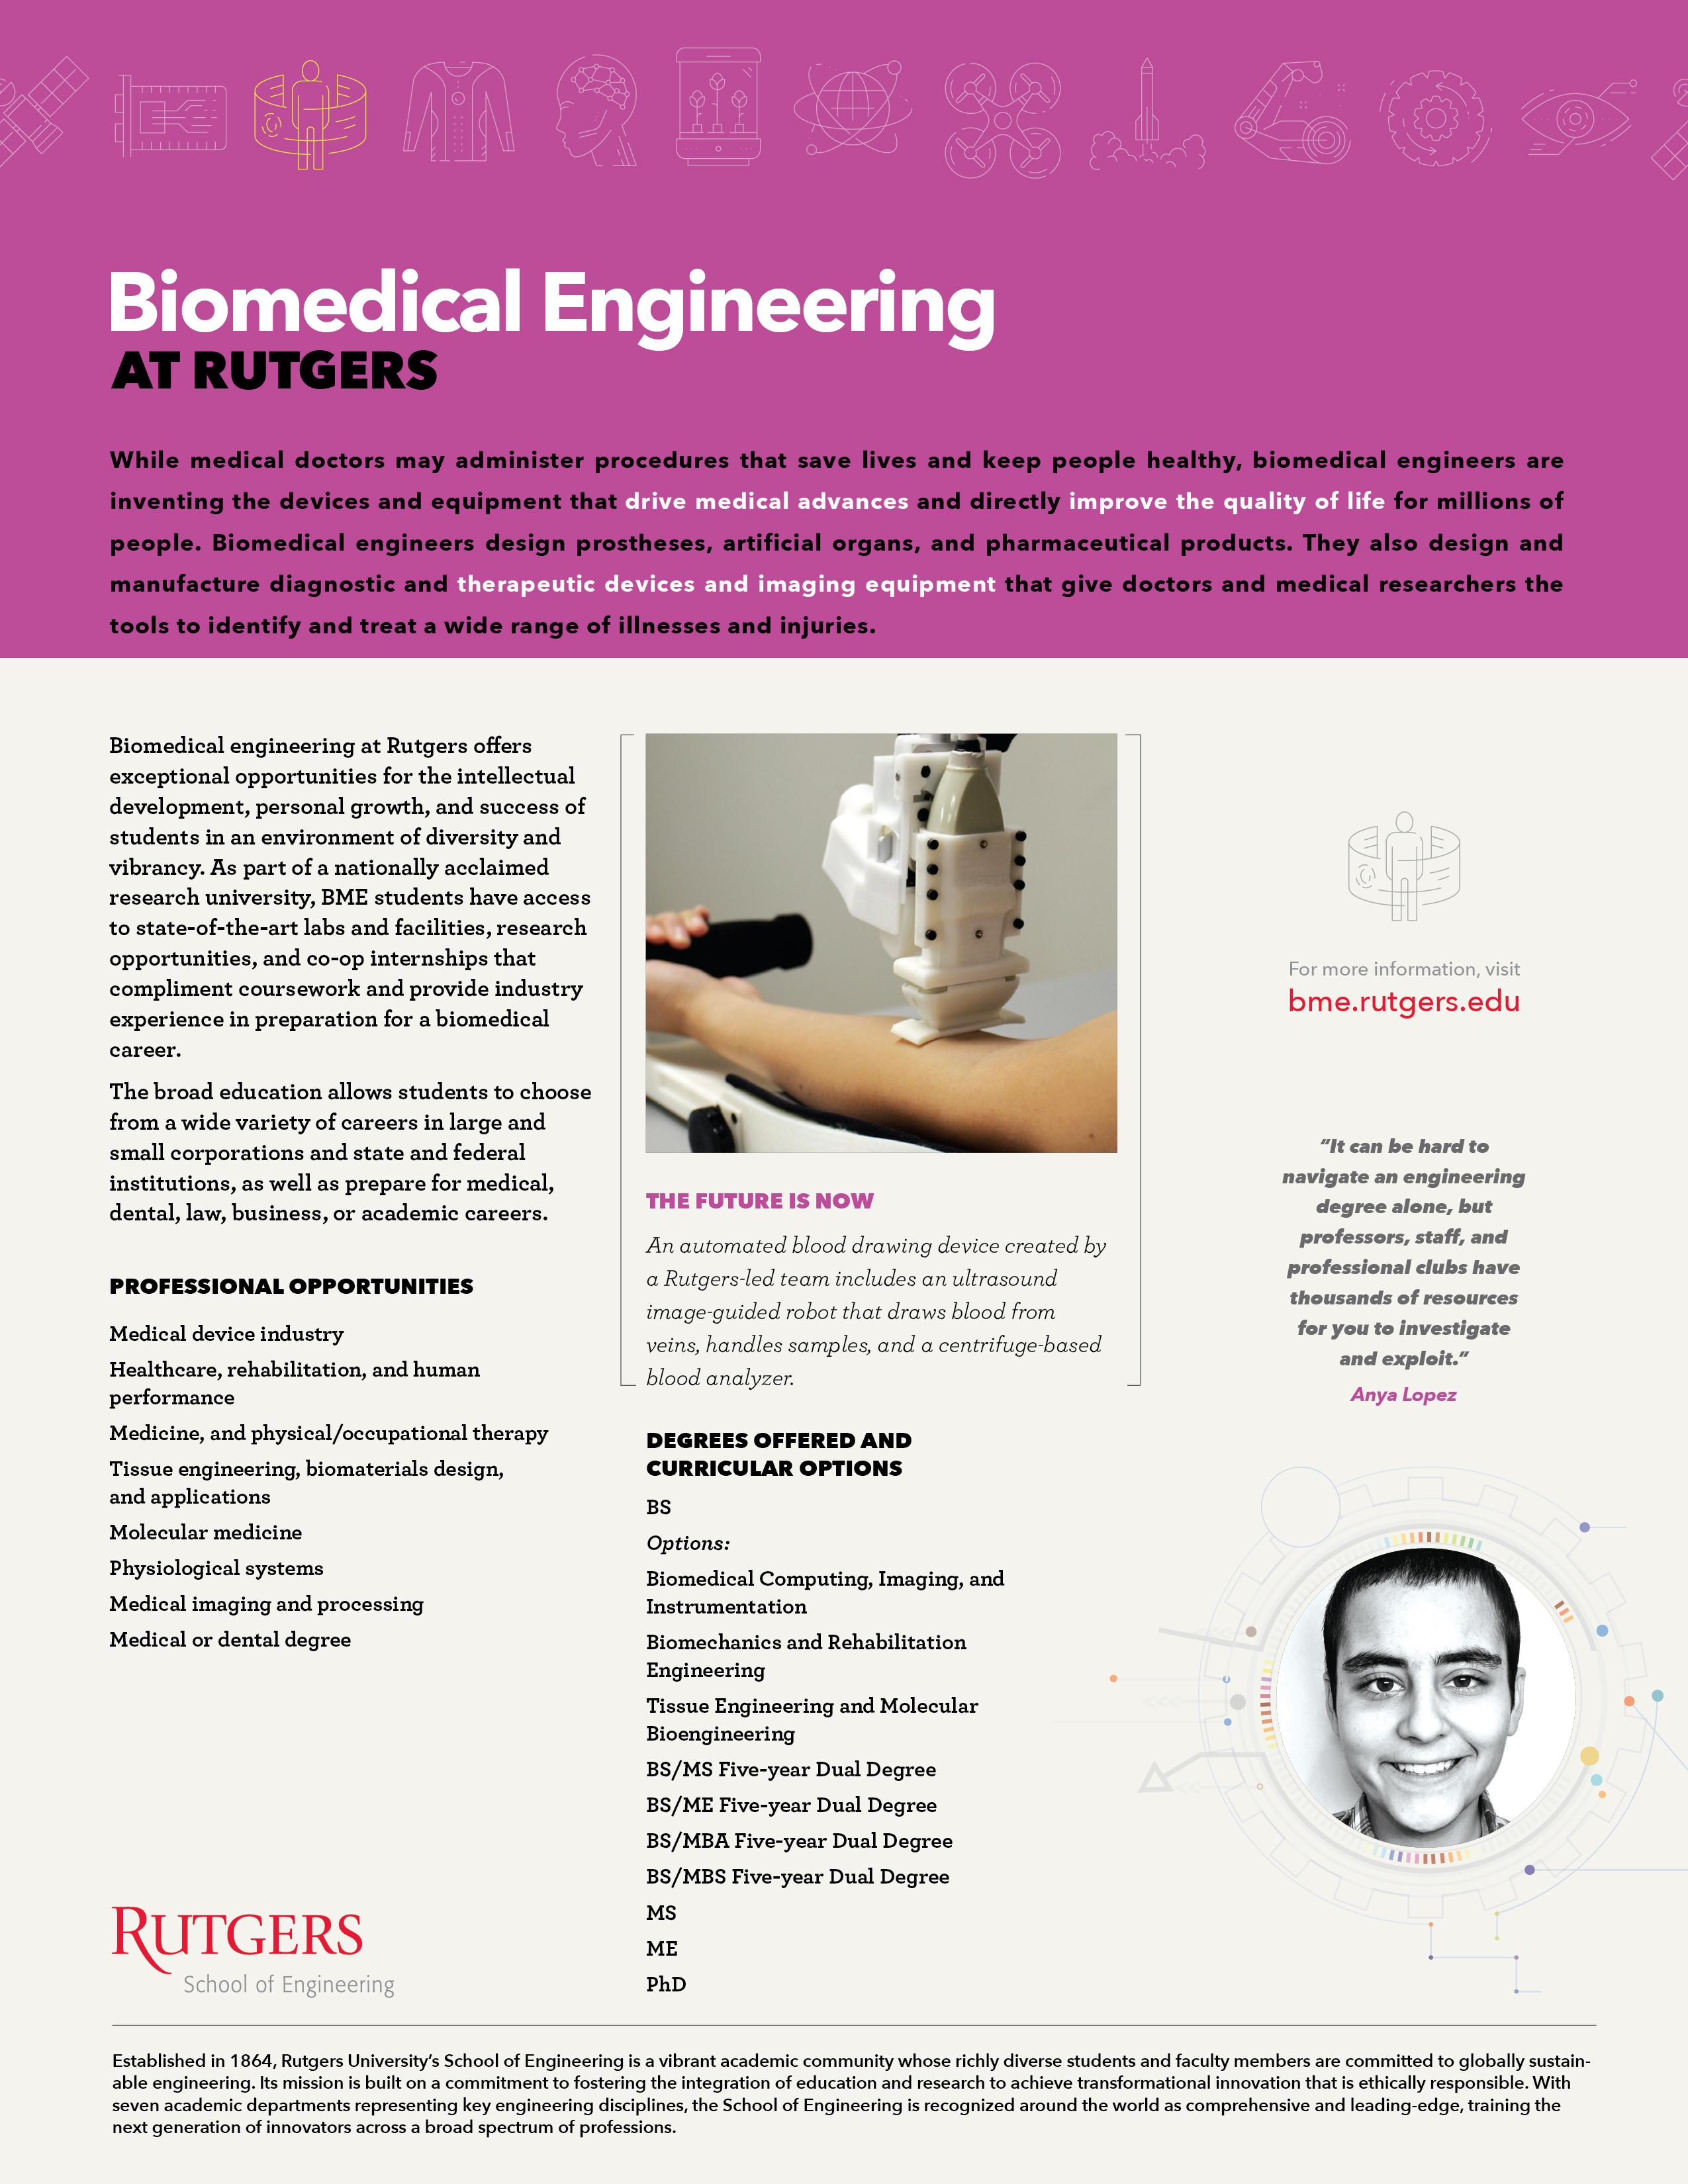 BME Page 1.jpg